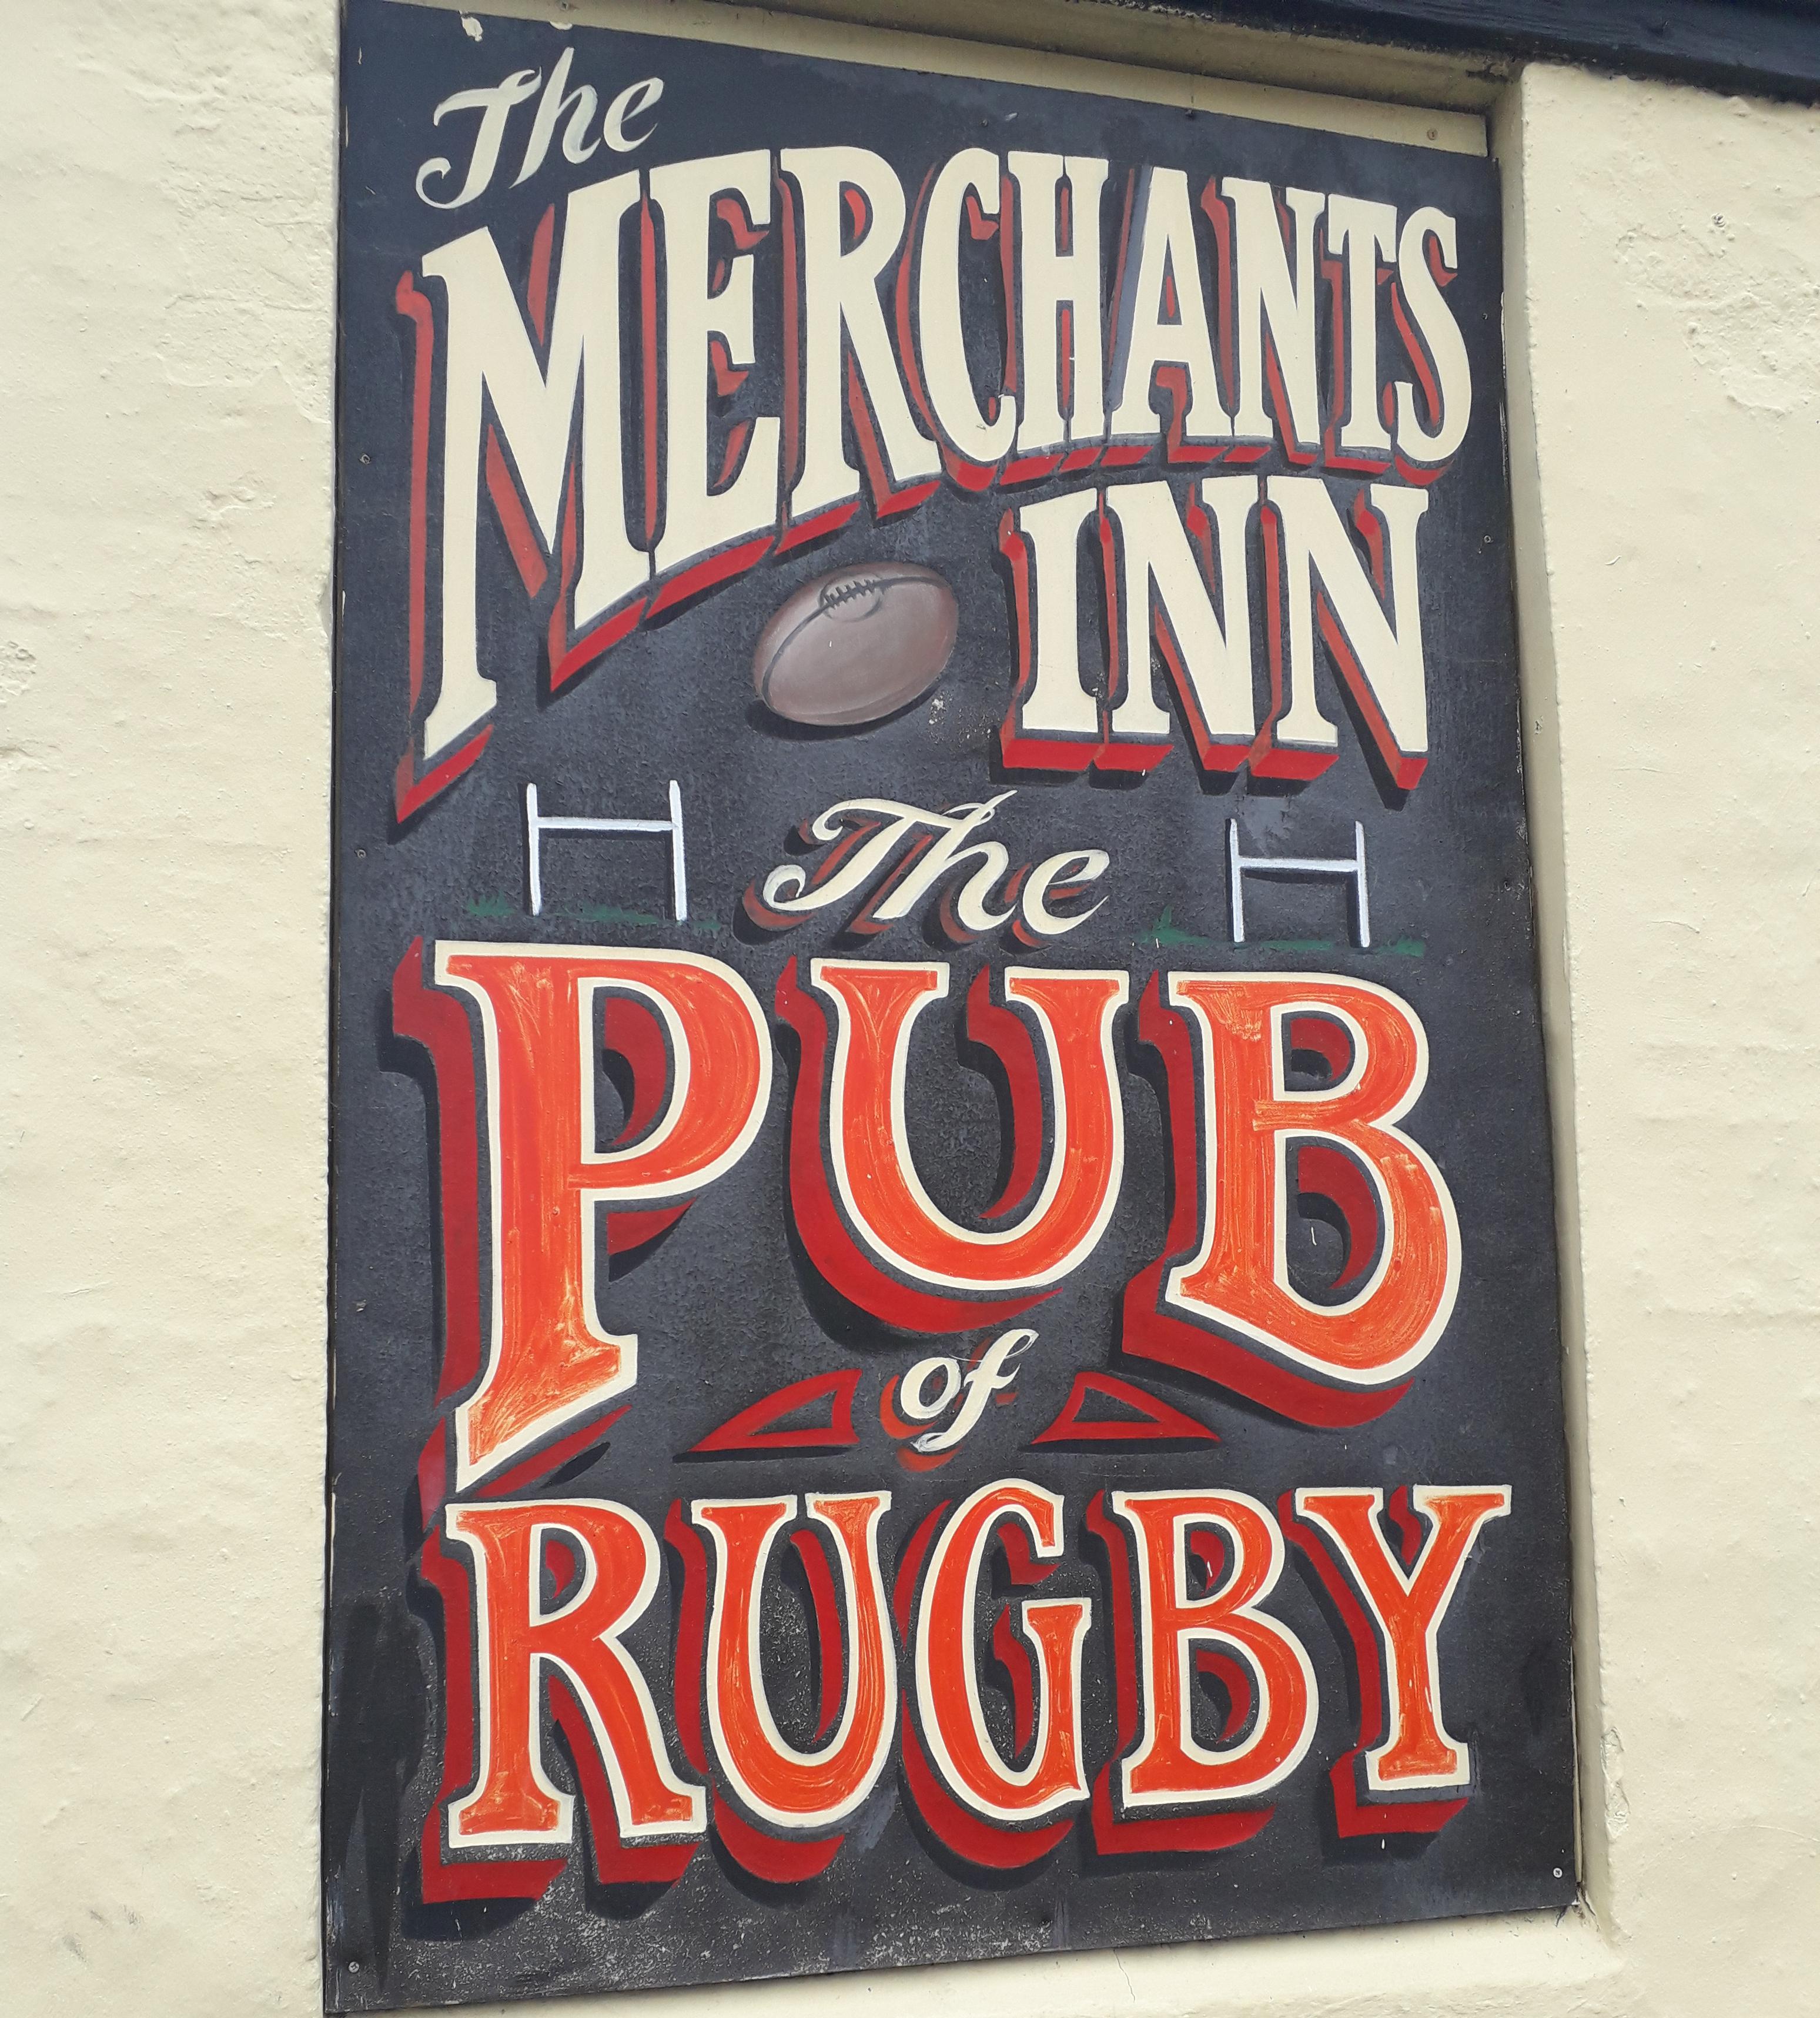 Colour photograph of the Merchants Inn pub sign